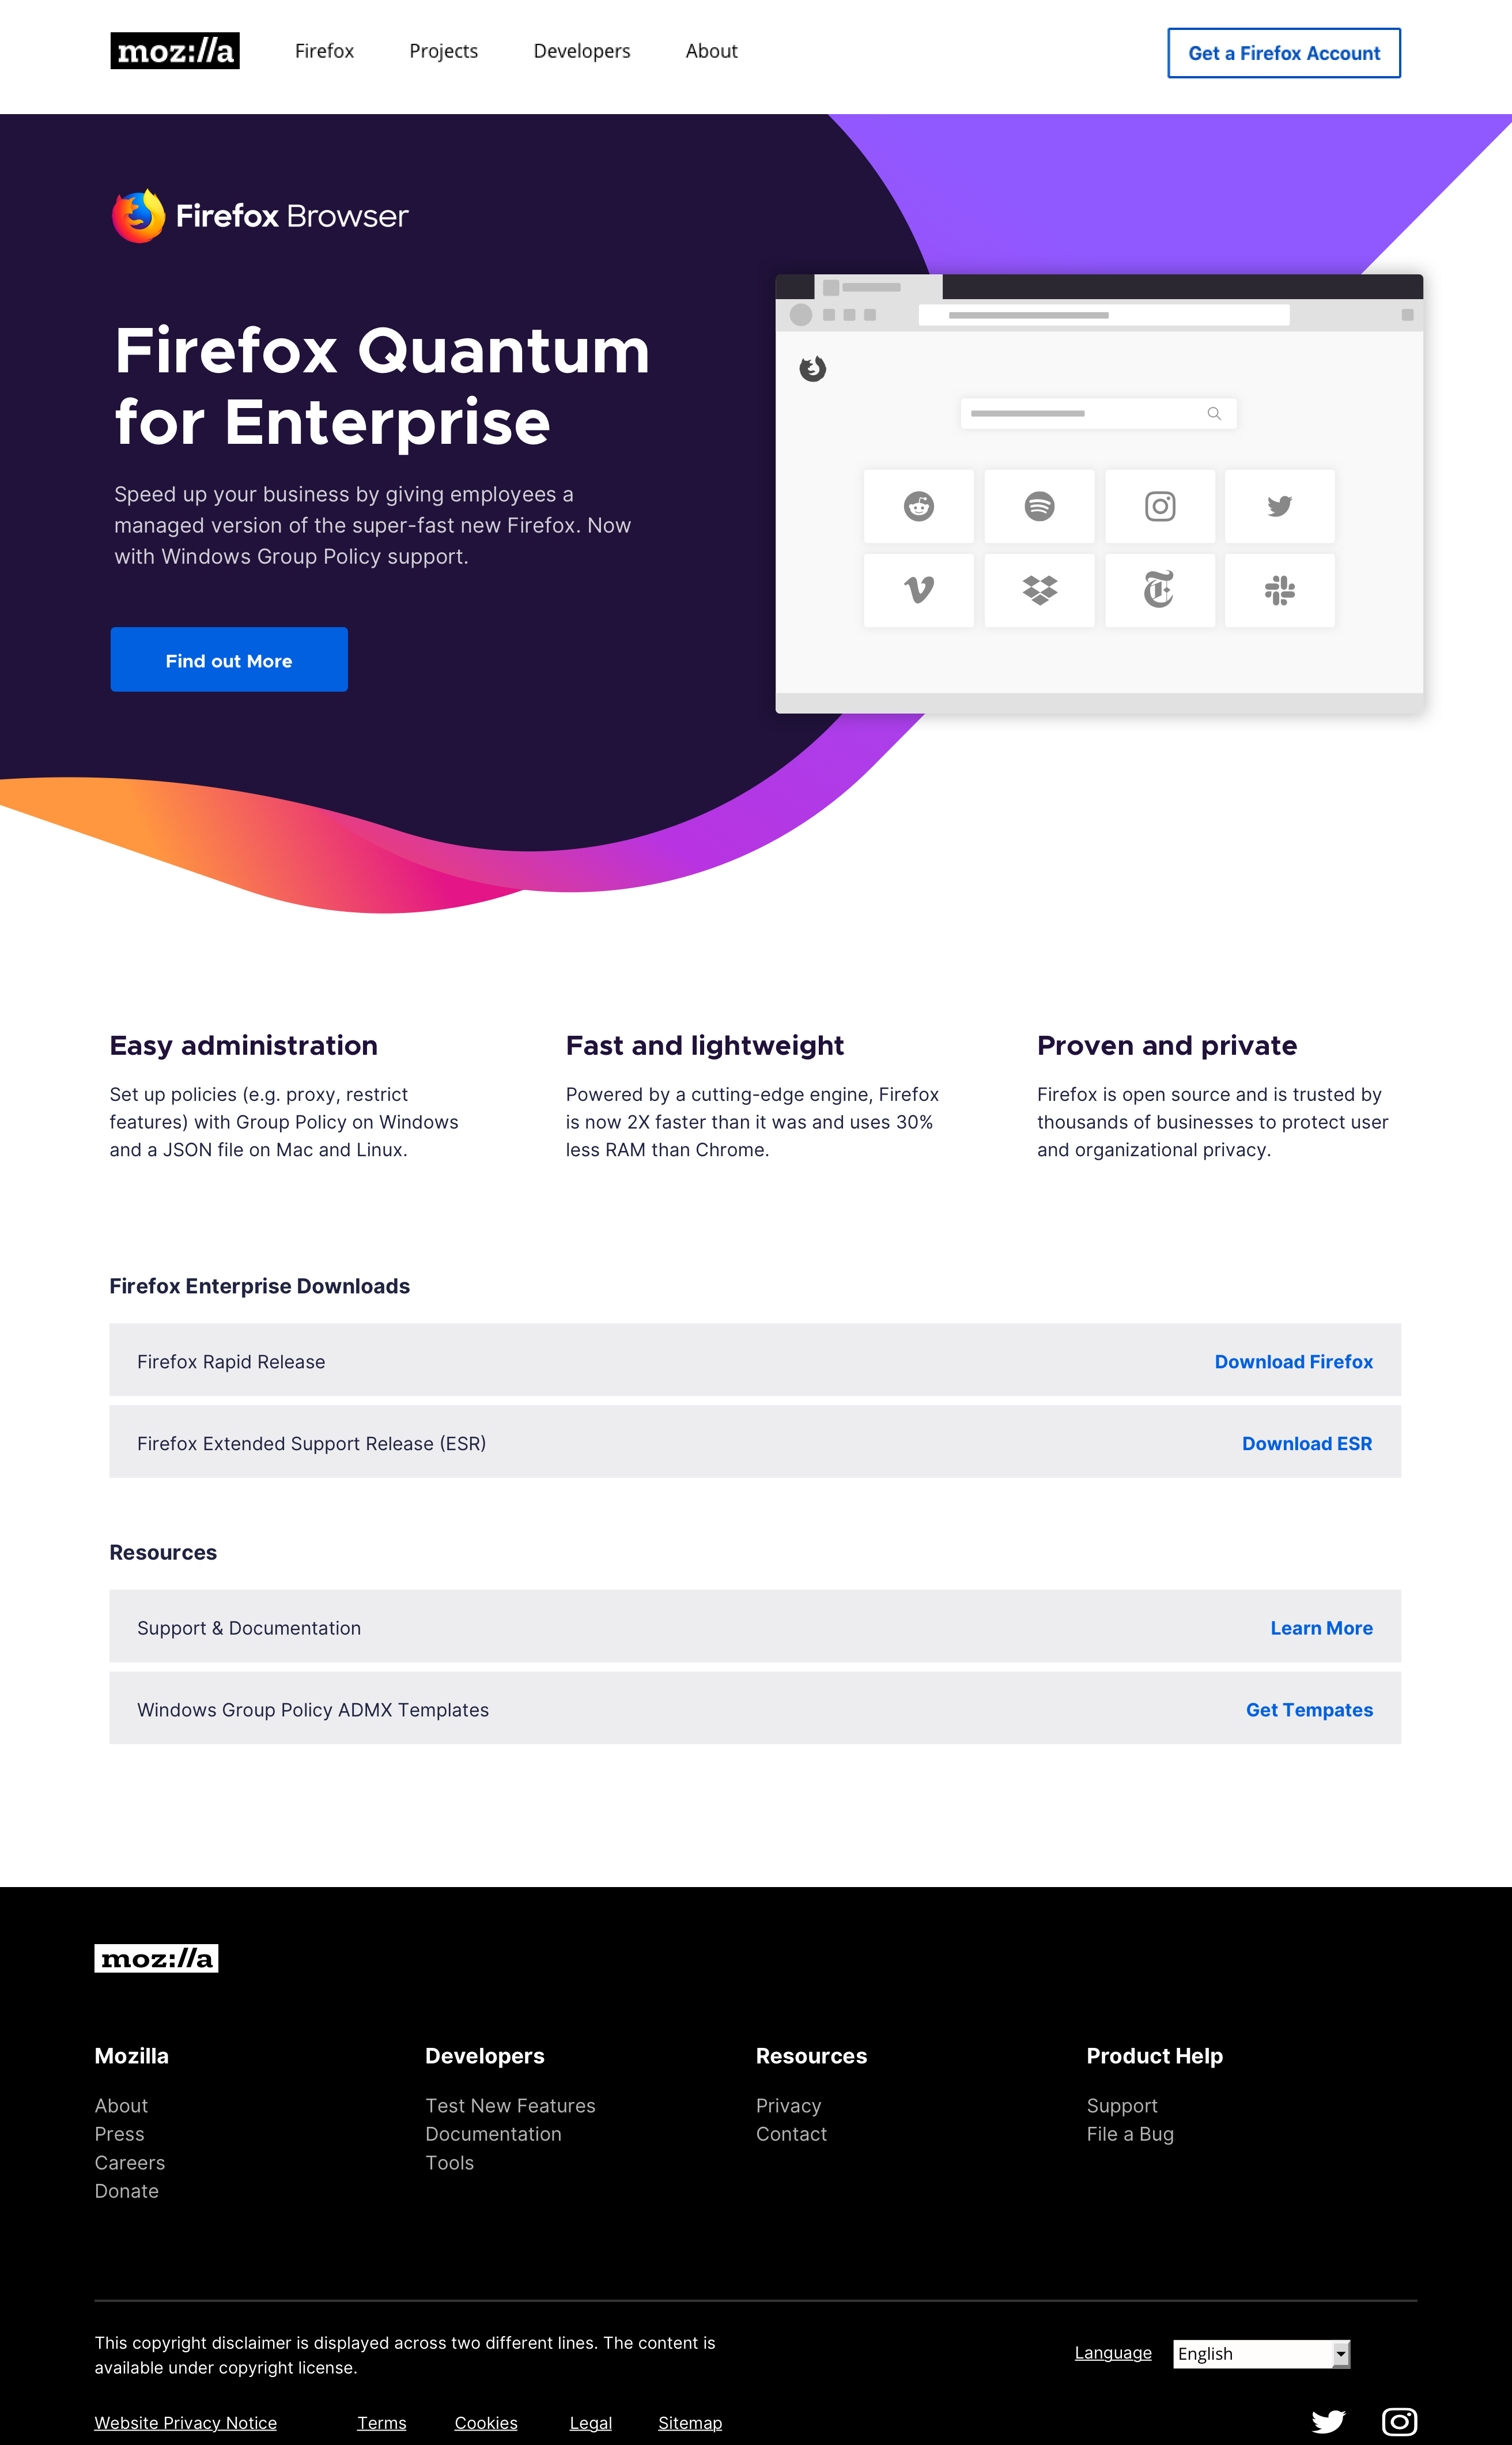 Update /enterprise visual design [July 8] · Issue #7352